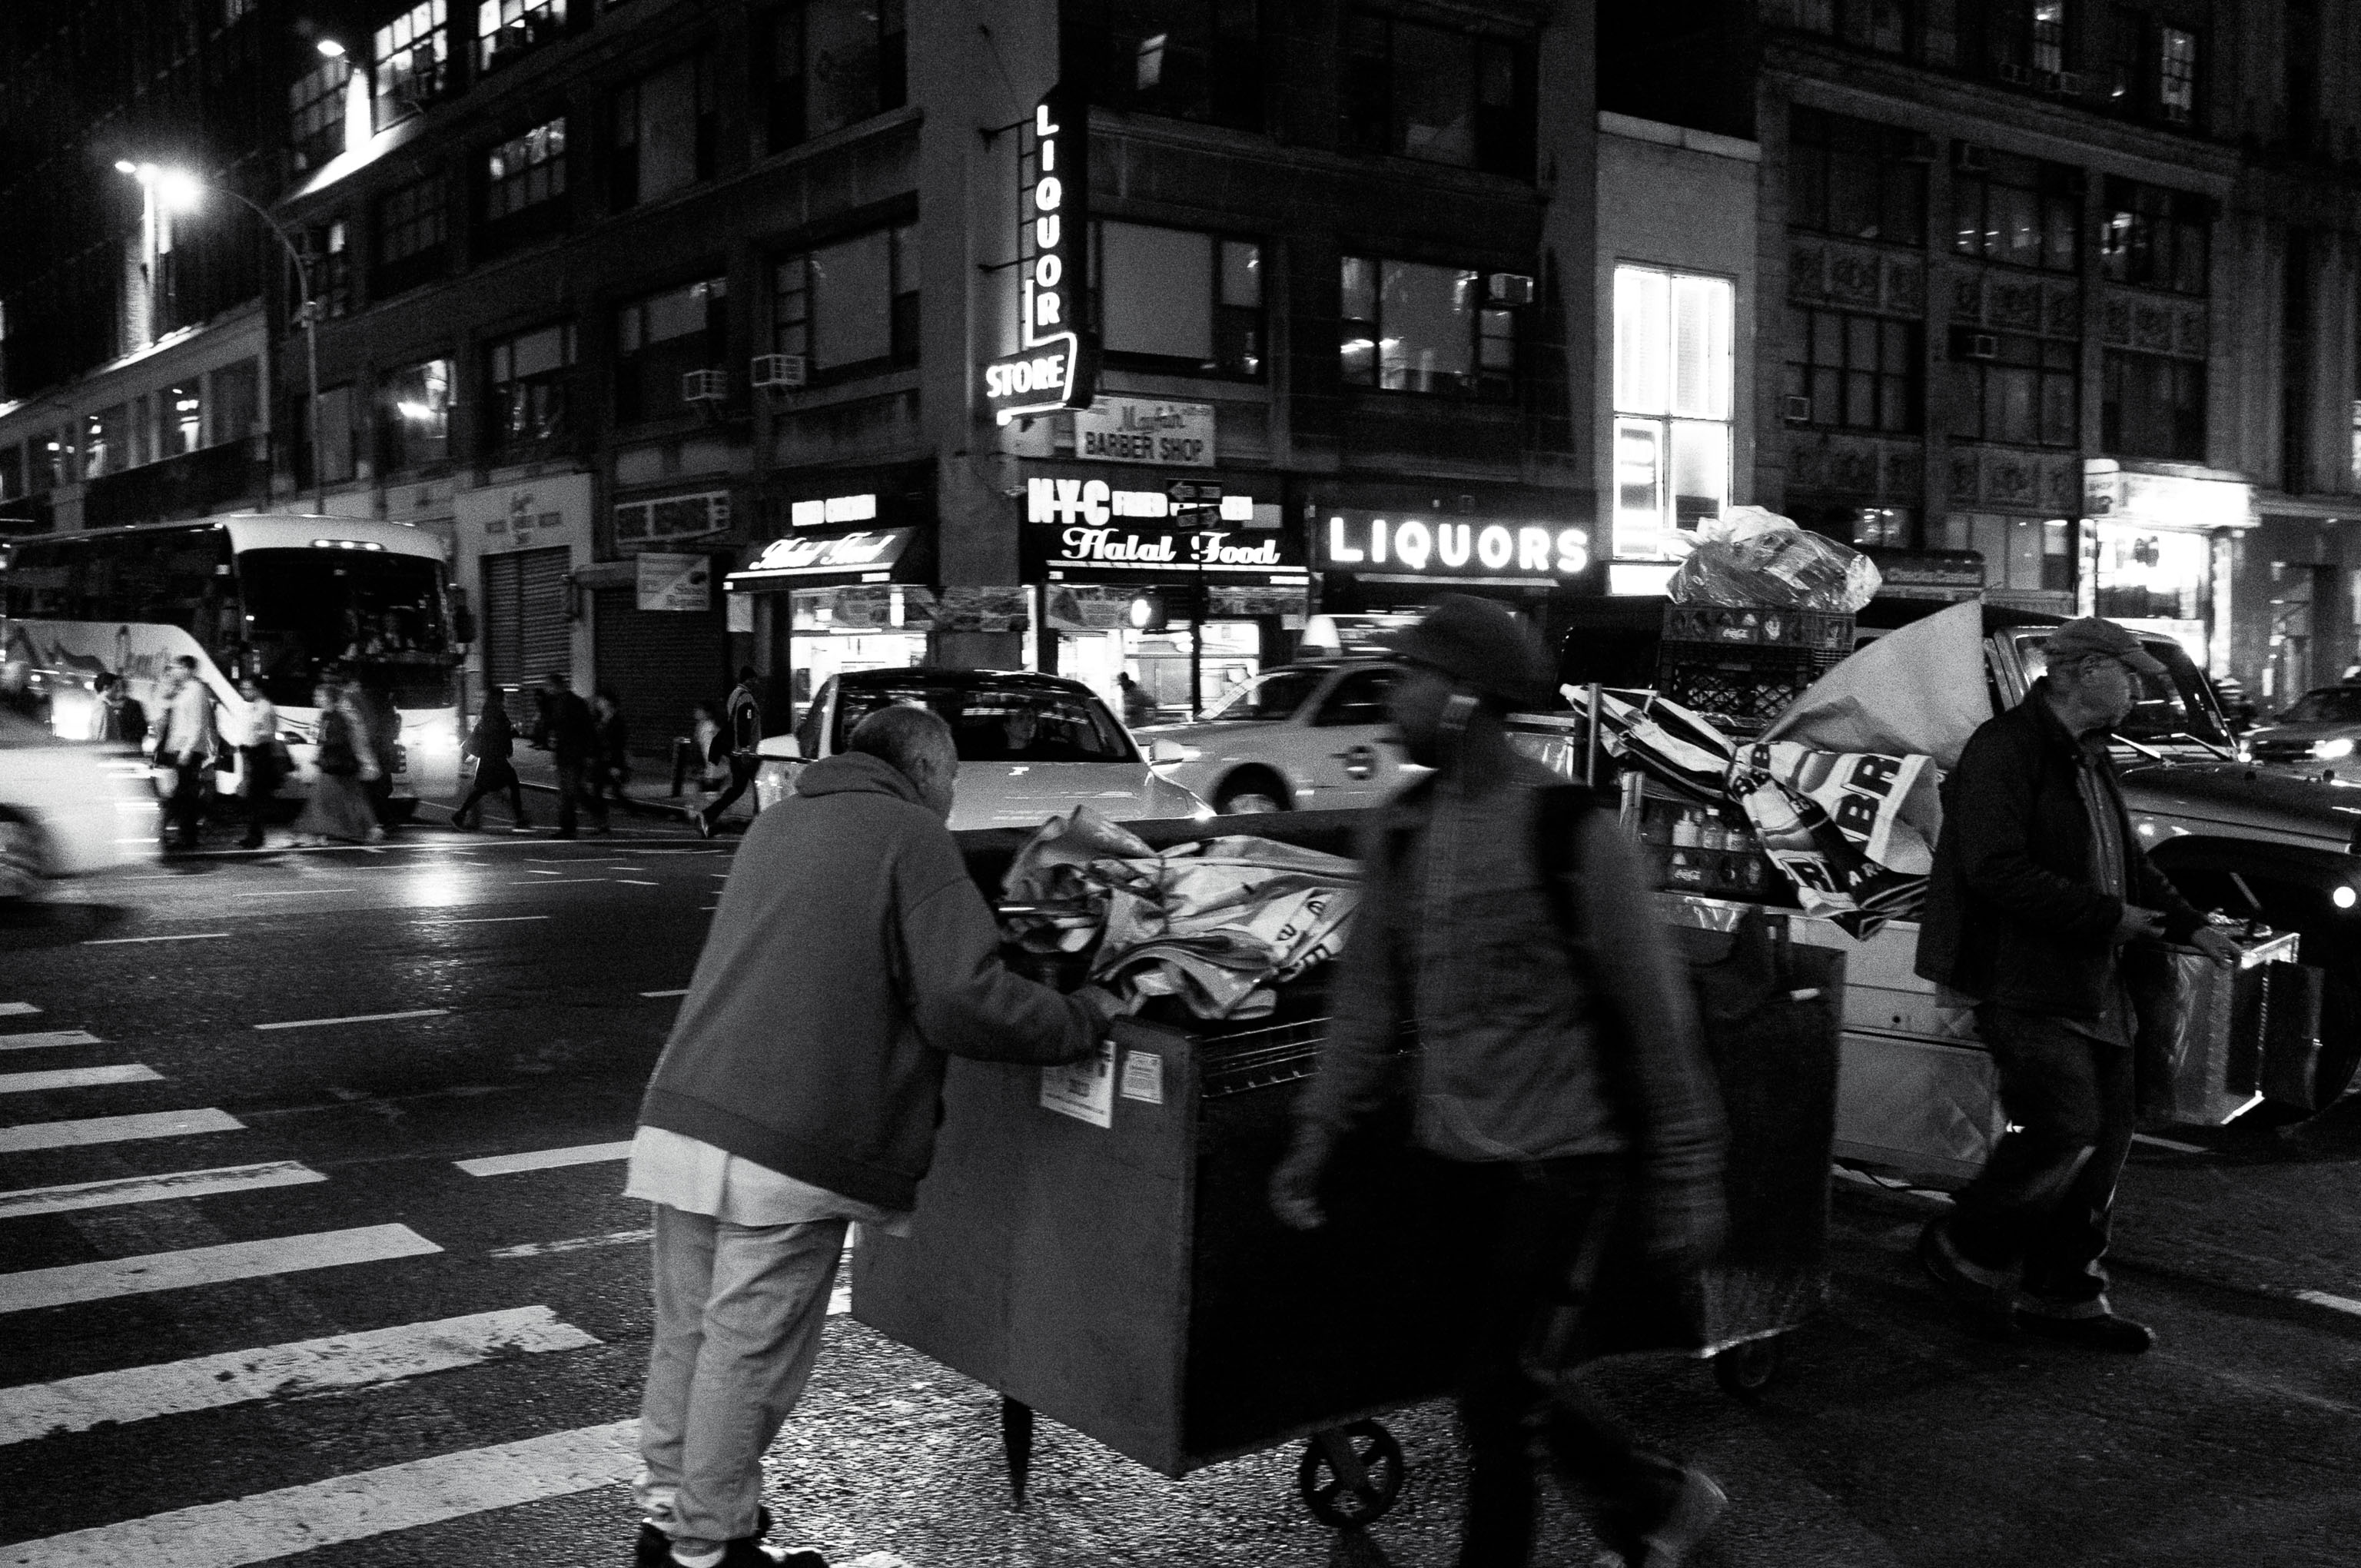 Sven-Michael---S-2013--18-[working-streets]---©-Sven-Michael-Golimowski.jpg